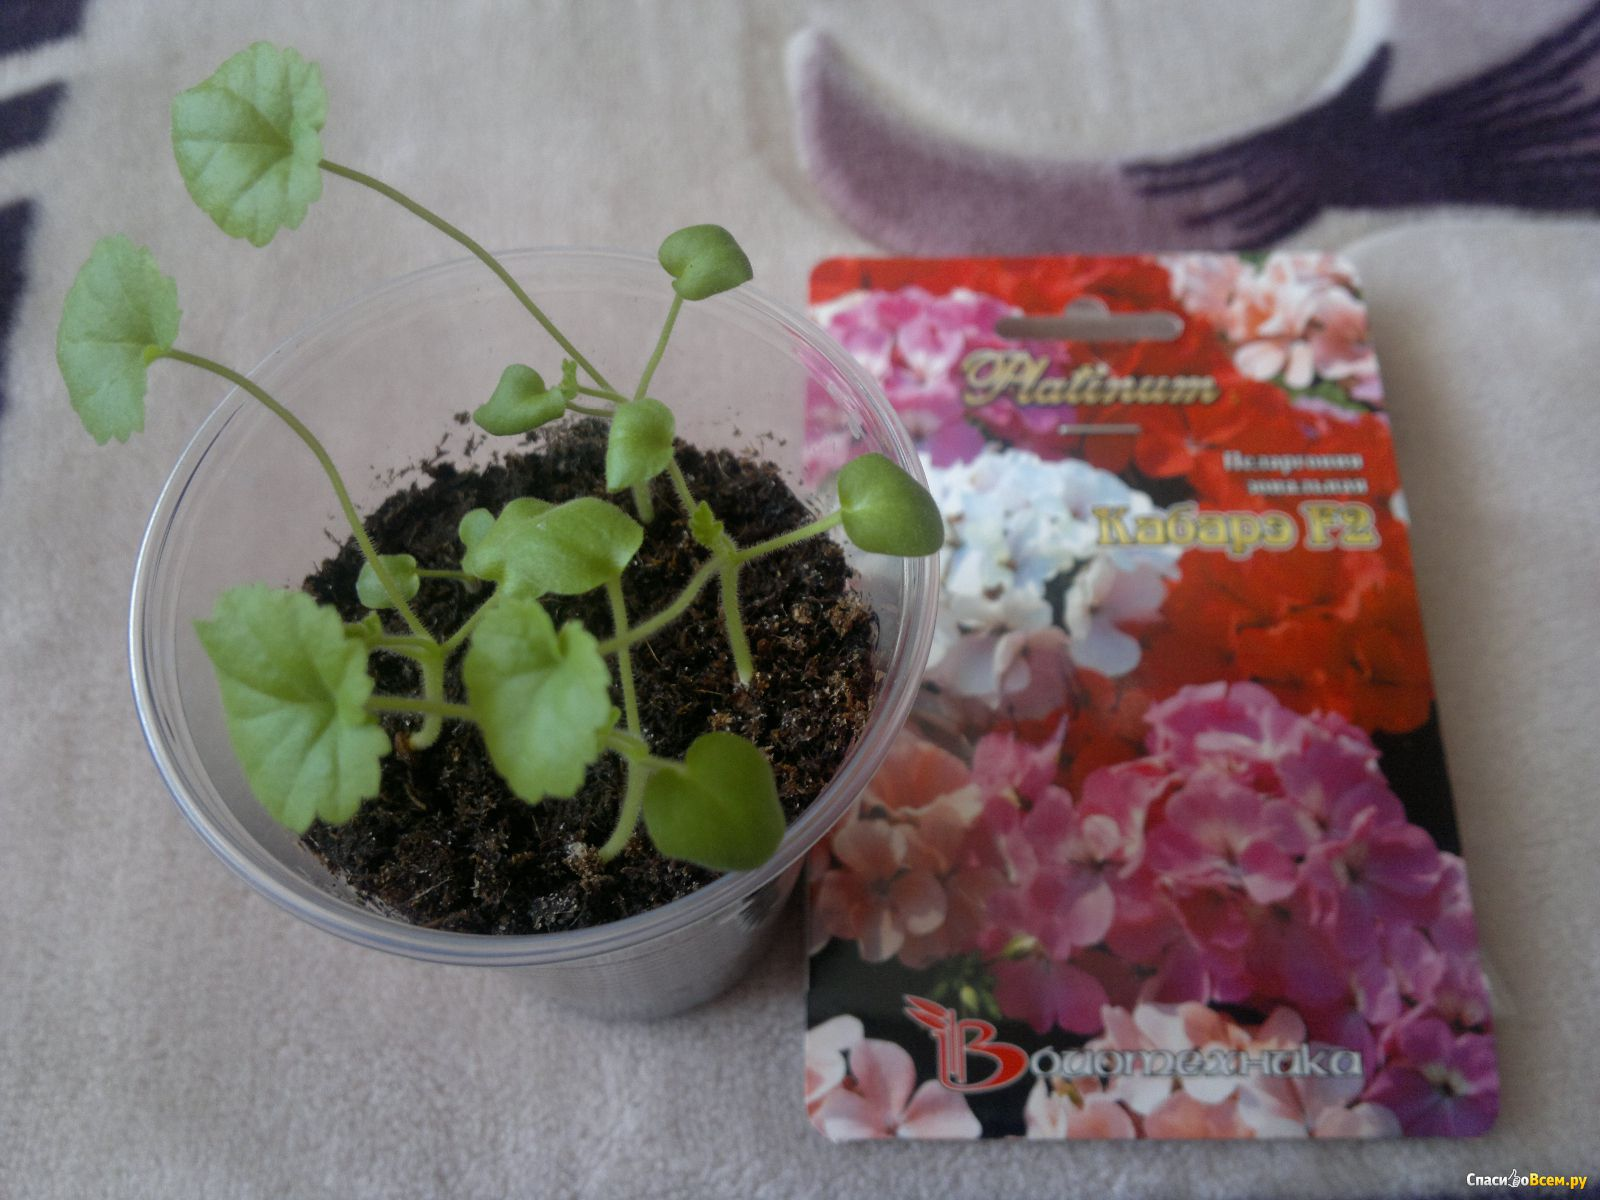 Выращивание герани из семян в домашних условиях с фото пошагово